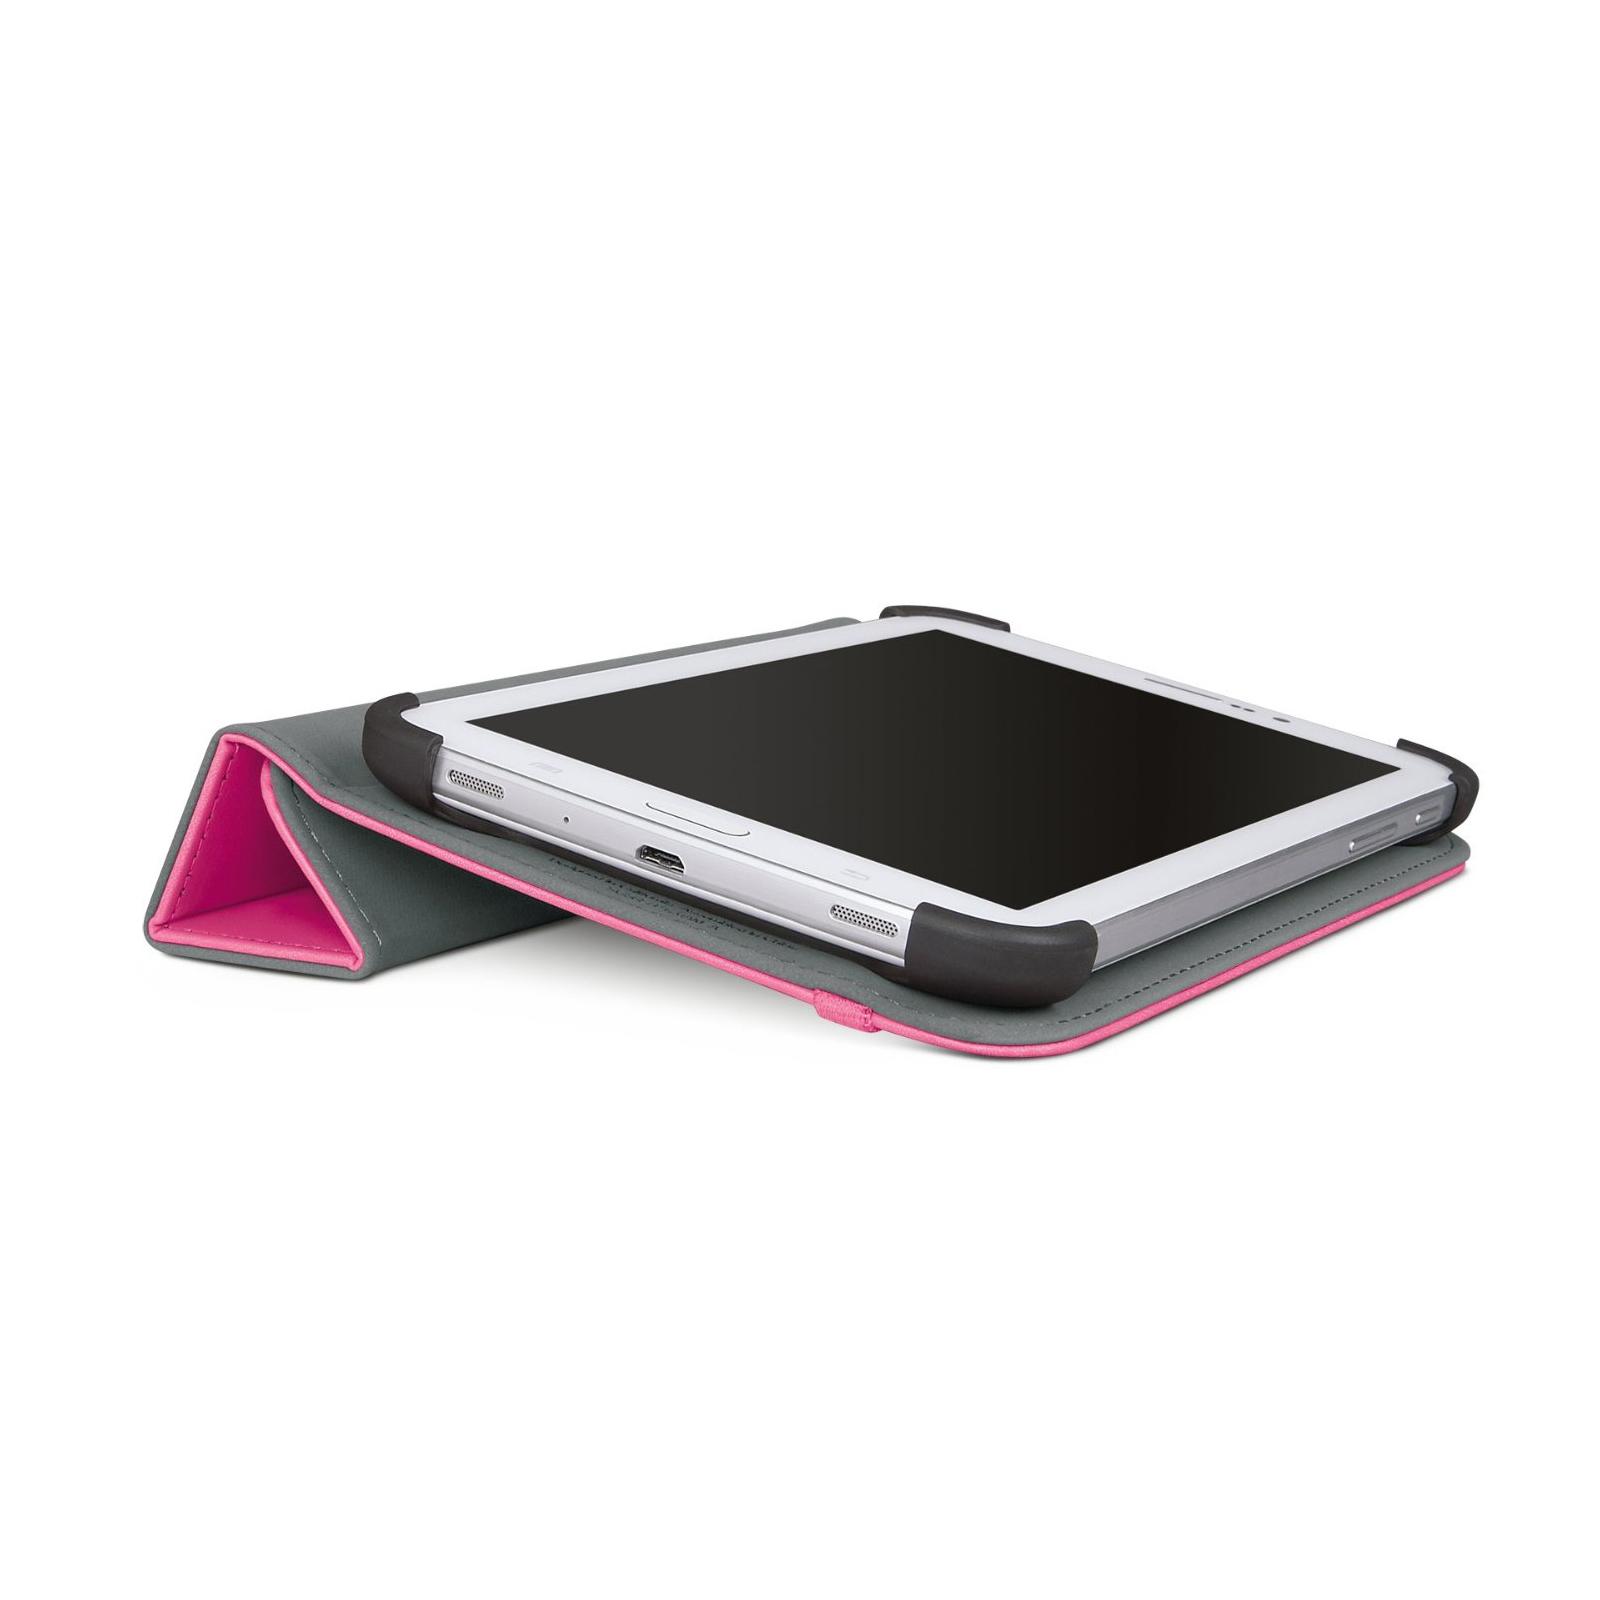 Чехол для планшета Belkin 7 GalaxyTab3 Tri-Fold Cover Stand/pink (F7P120vfC02) изображение 4